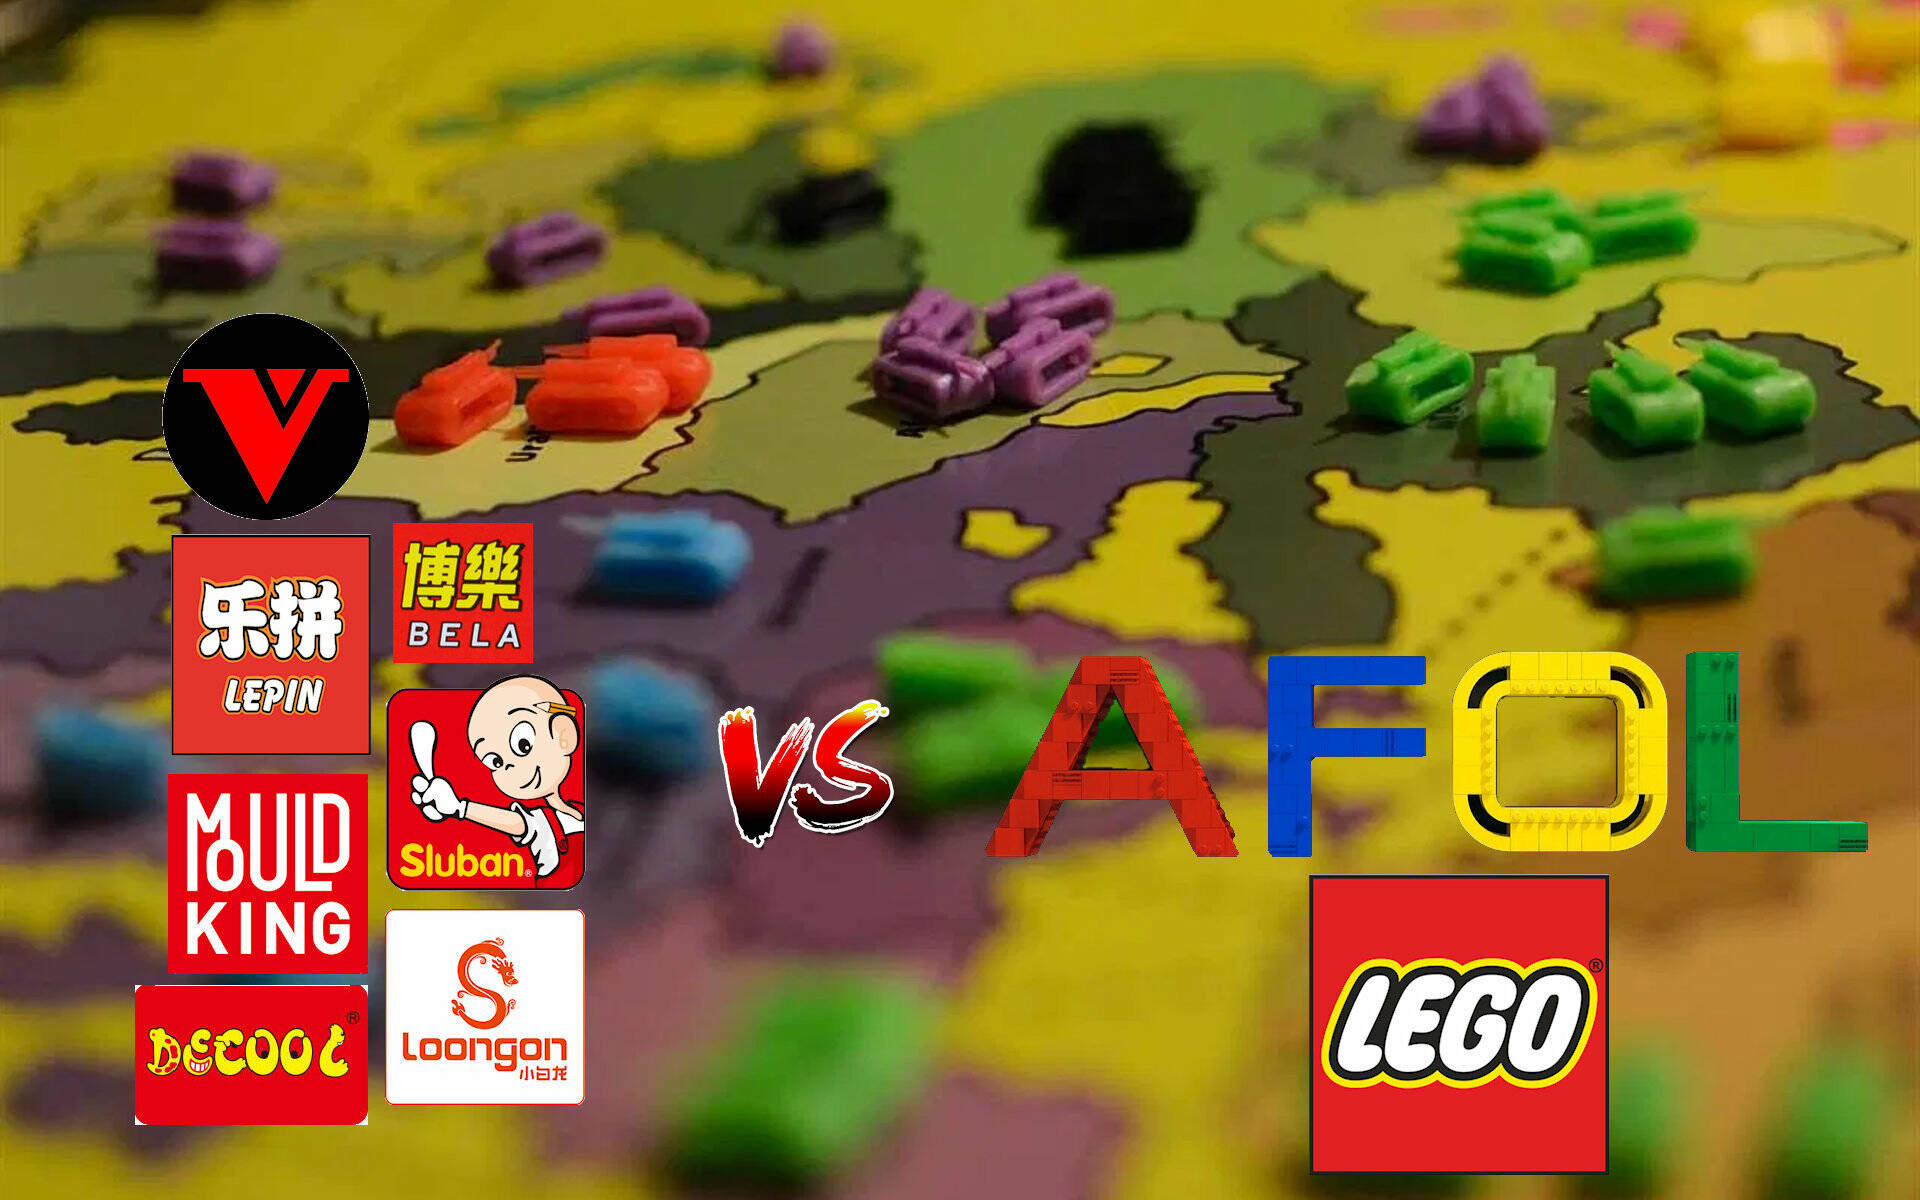 LEGO VS LEPIN THE CLONE WARS